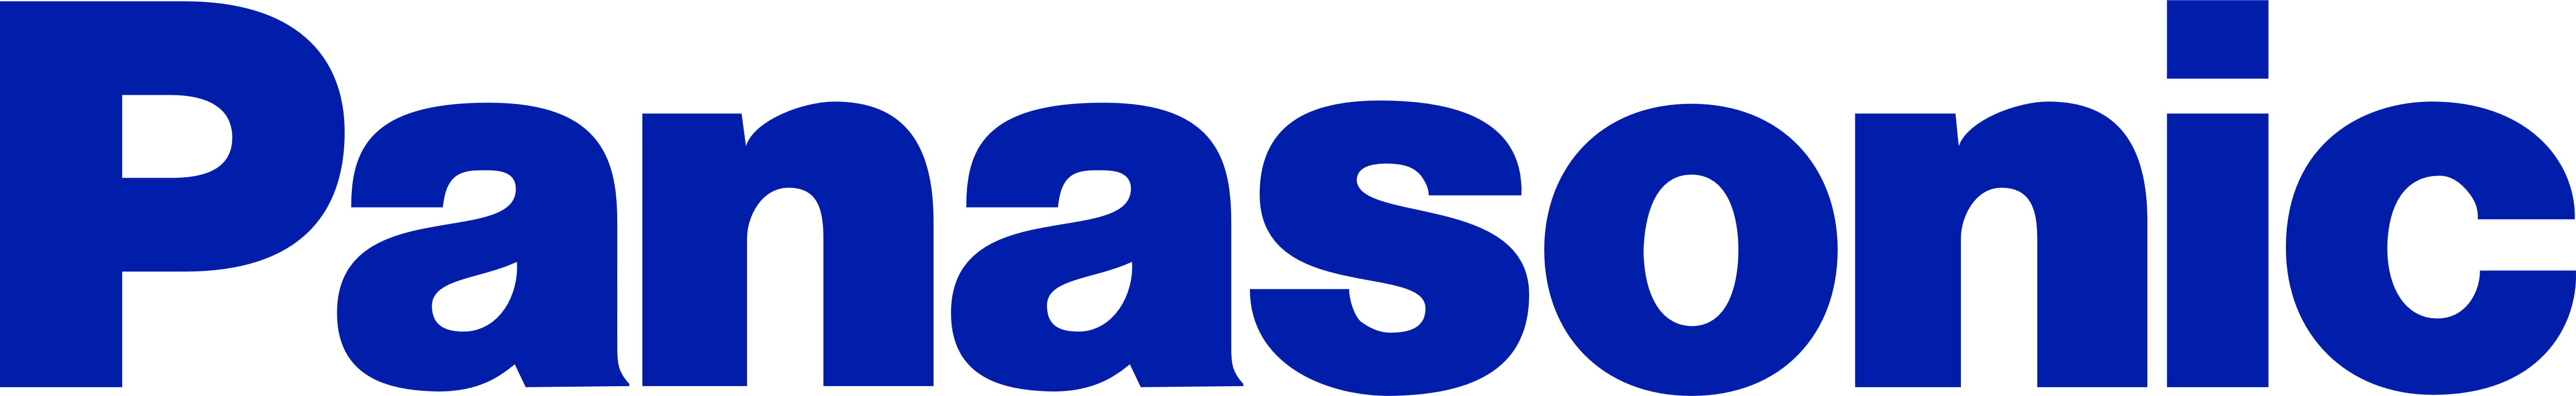 Panasonic Scanners